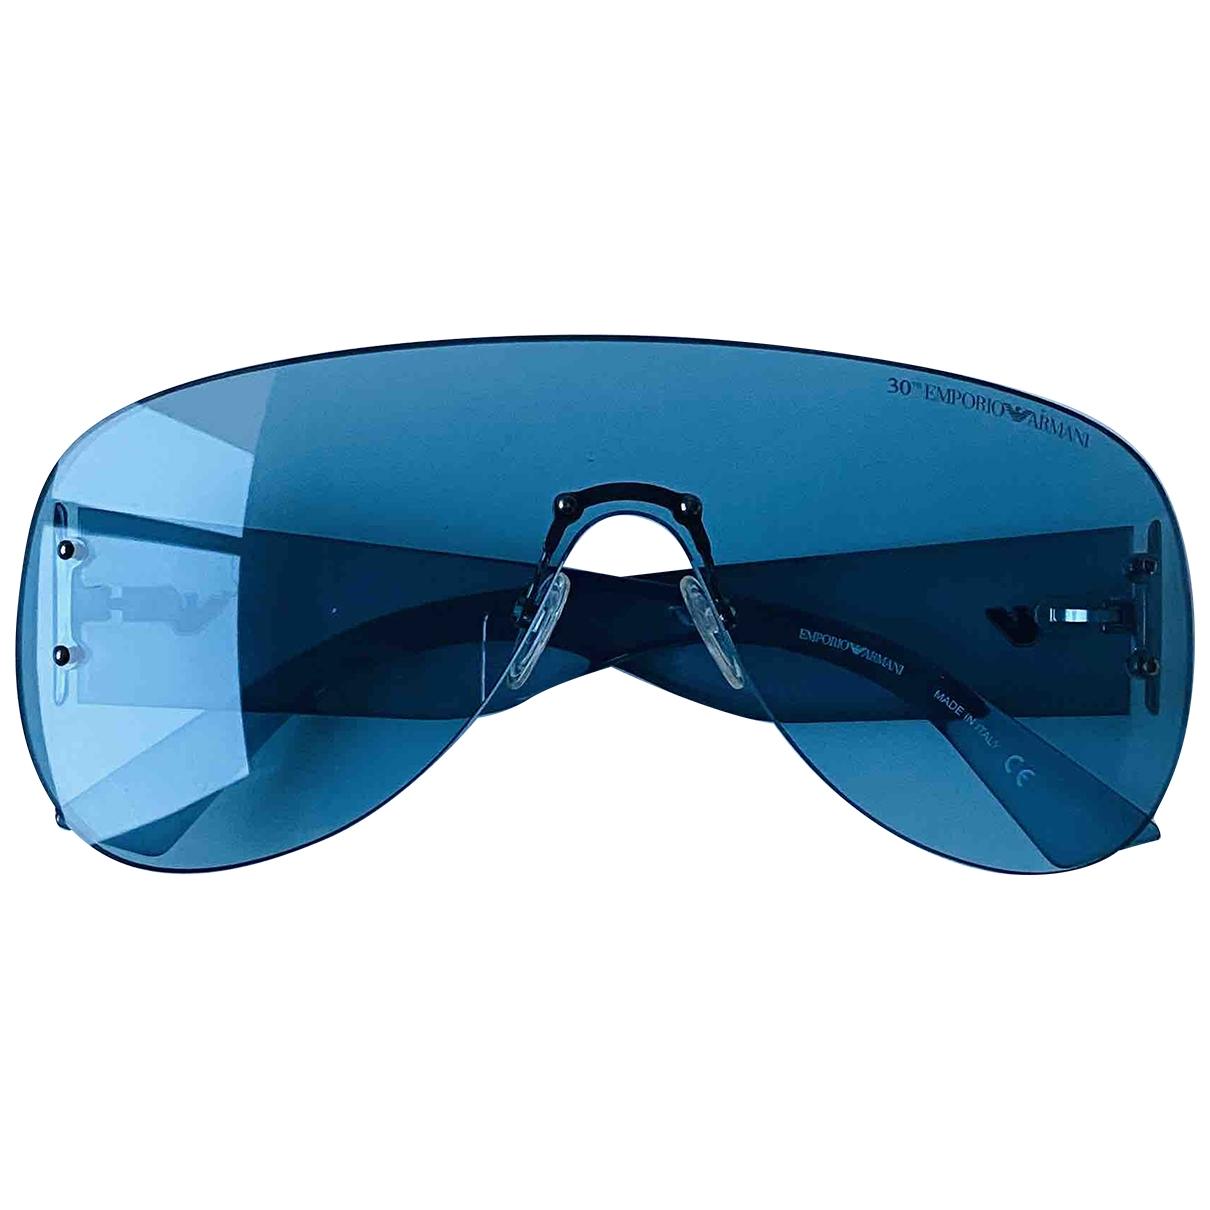 Armani Jeans \N Sonnenbrillen in  Blau Kunststoff